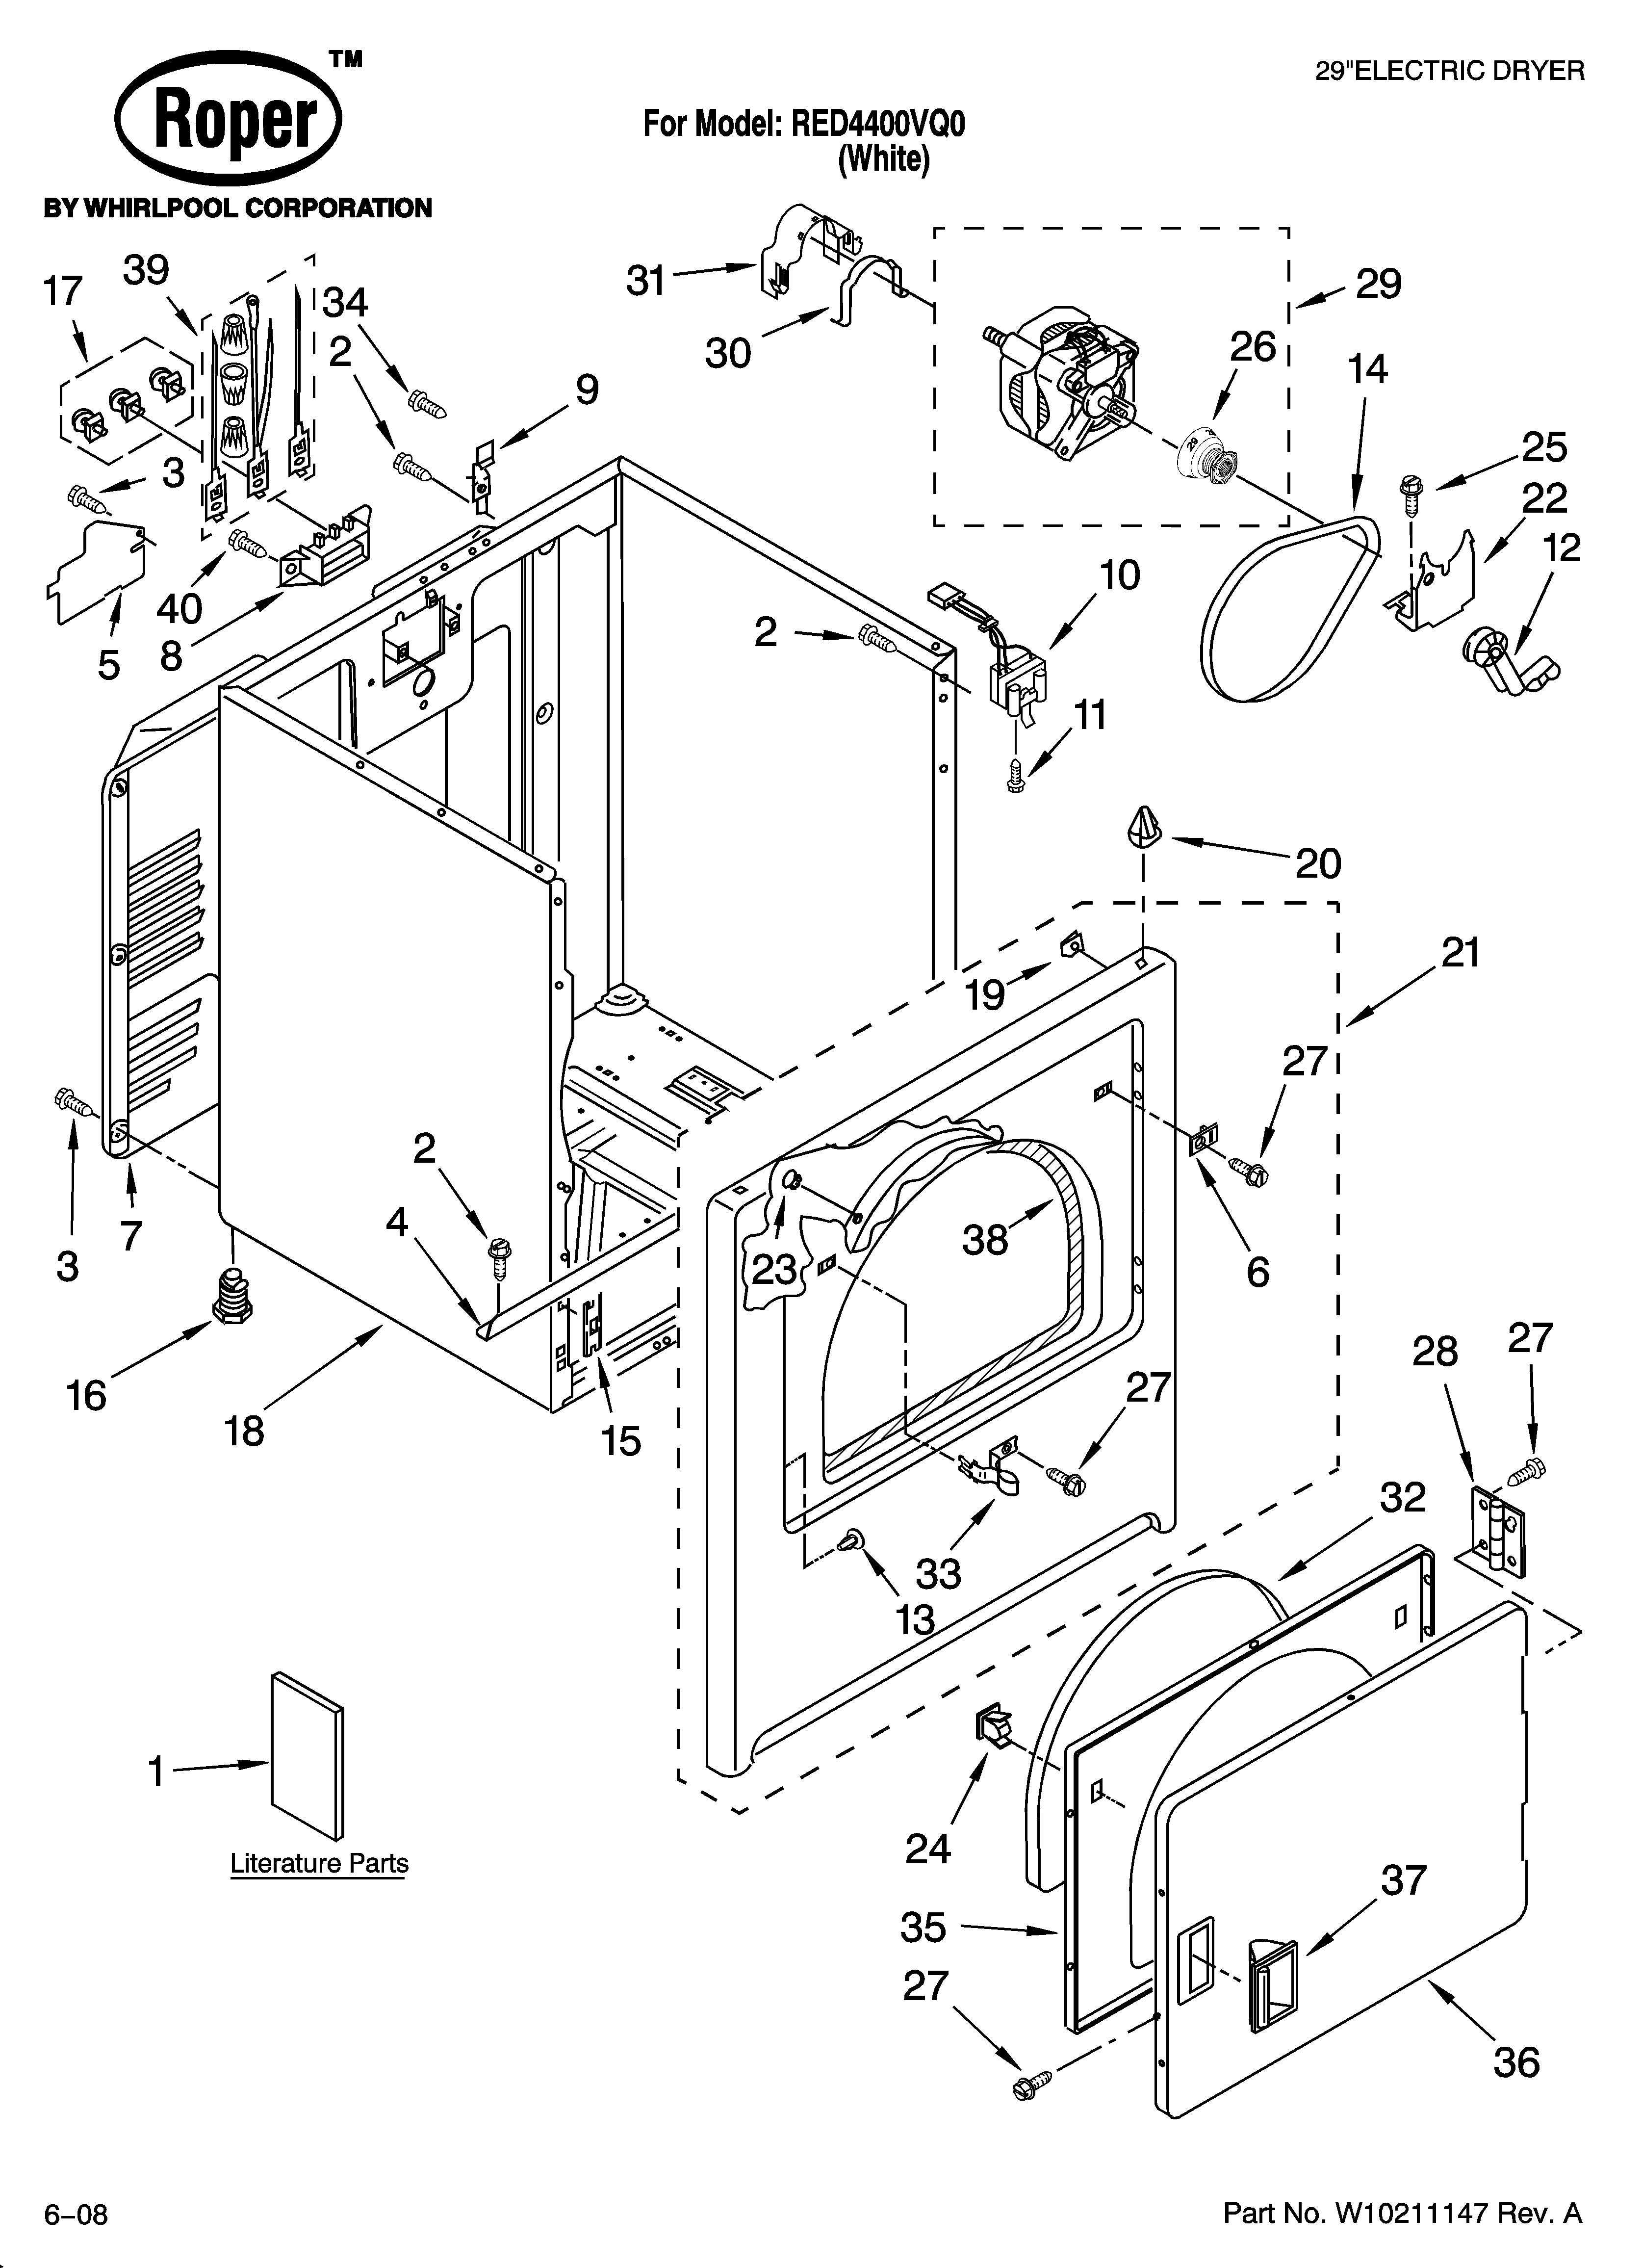 27 Roper Dryer Parts Diagram - Free Wiring Diagram Source   Roper Dryer Red4440vq1 Wiring Diagram      Free Wiring Diagram Source